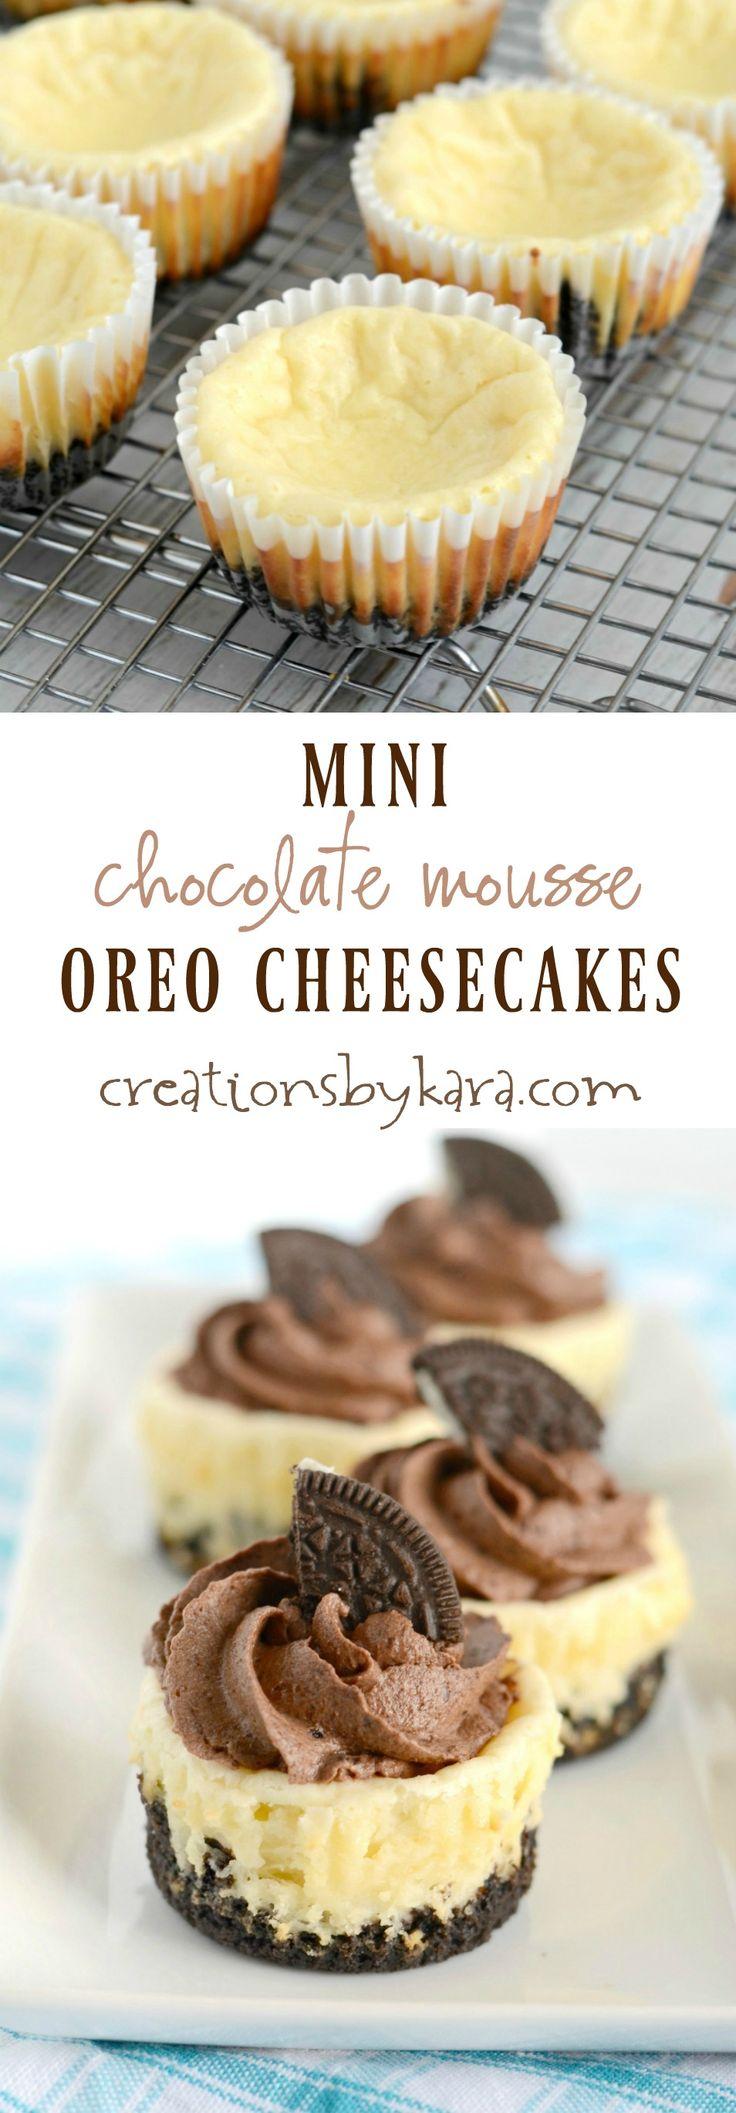 Mini Oreo Cheesecakes with Chocolate Mousse